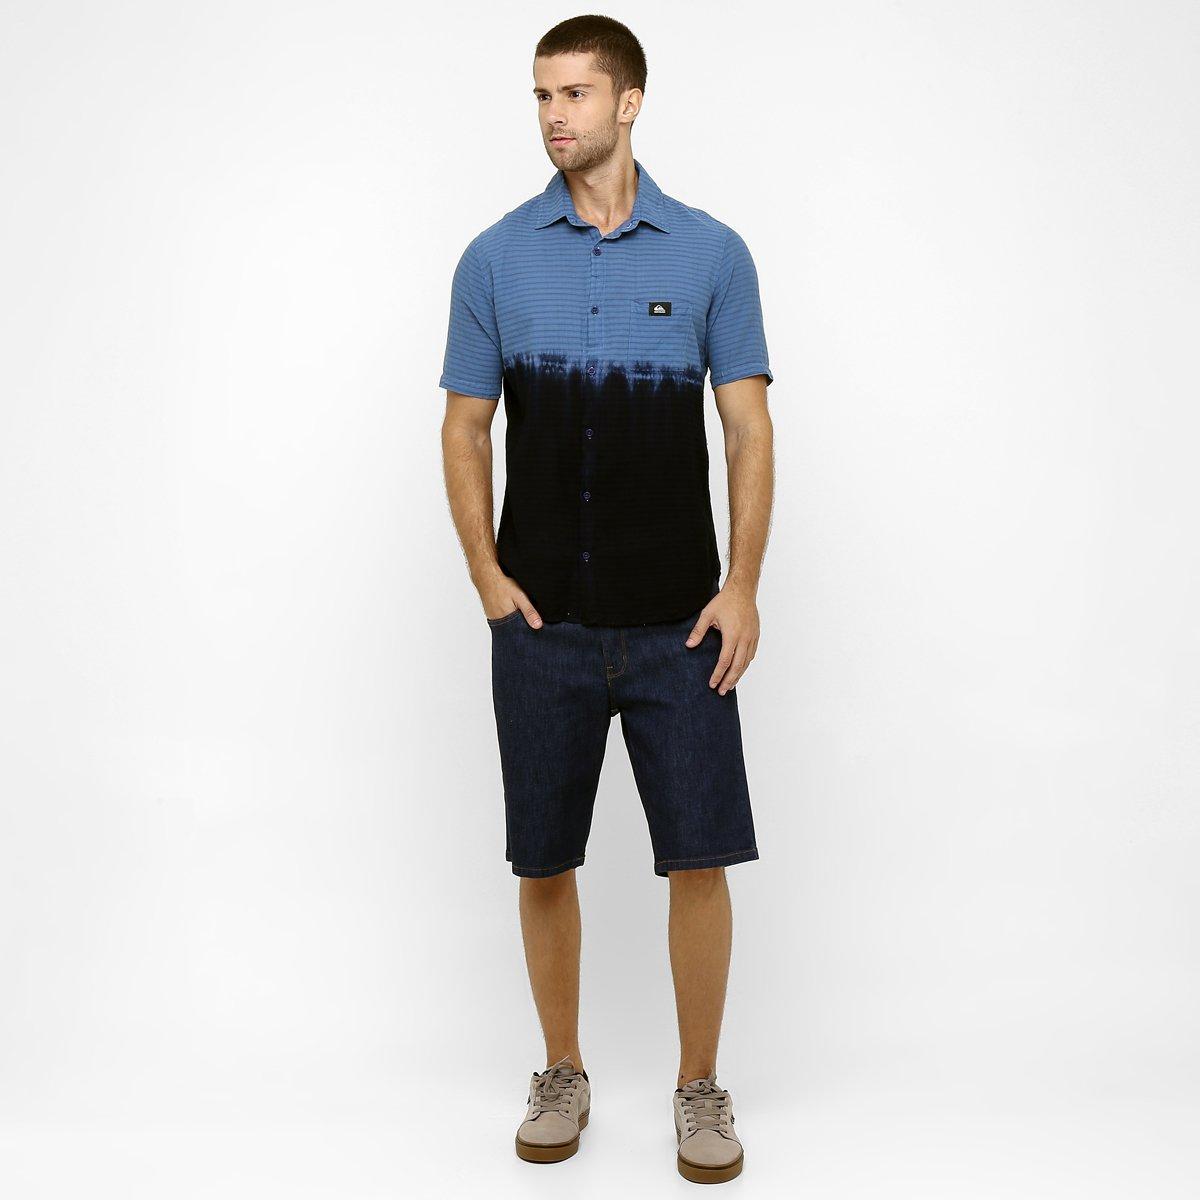 6b6e601c77122 ... Camisa Quiksilver Malibu - Compre Agora 7e06e08dbb6ea ...